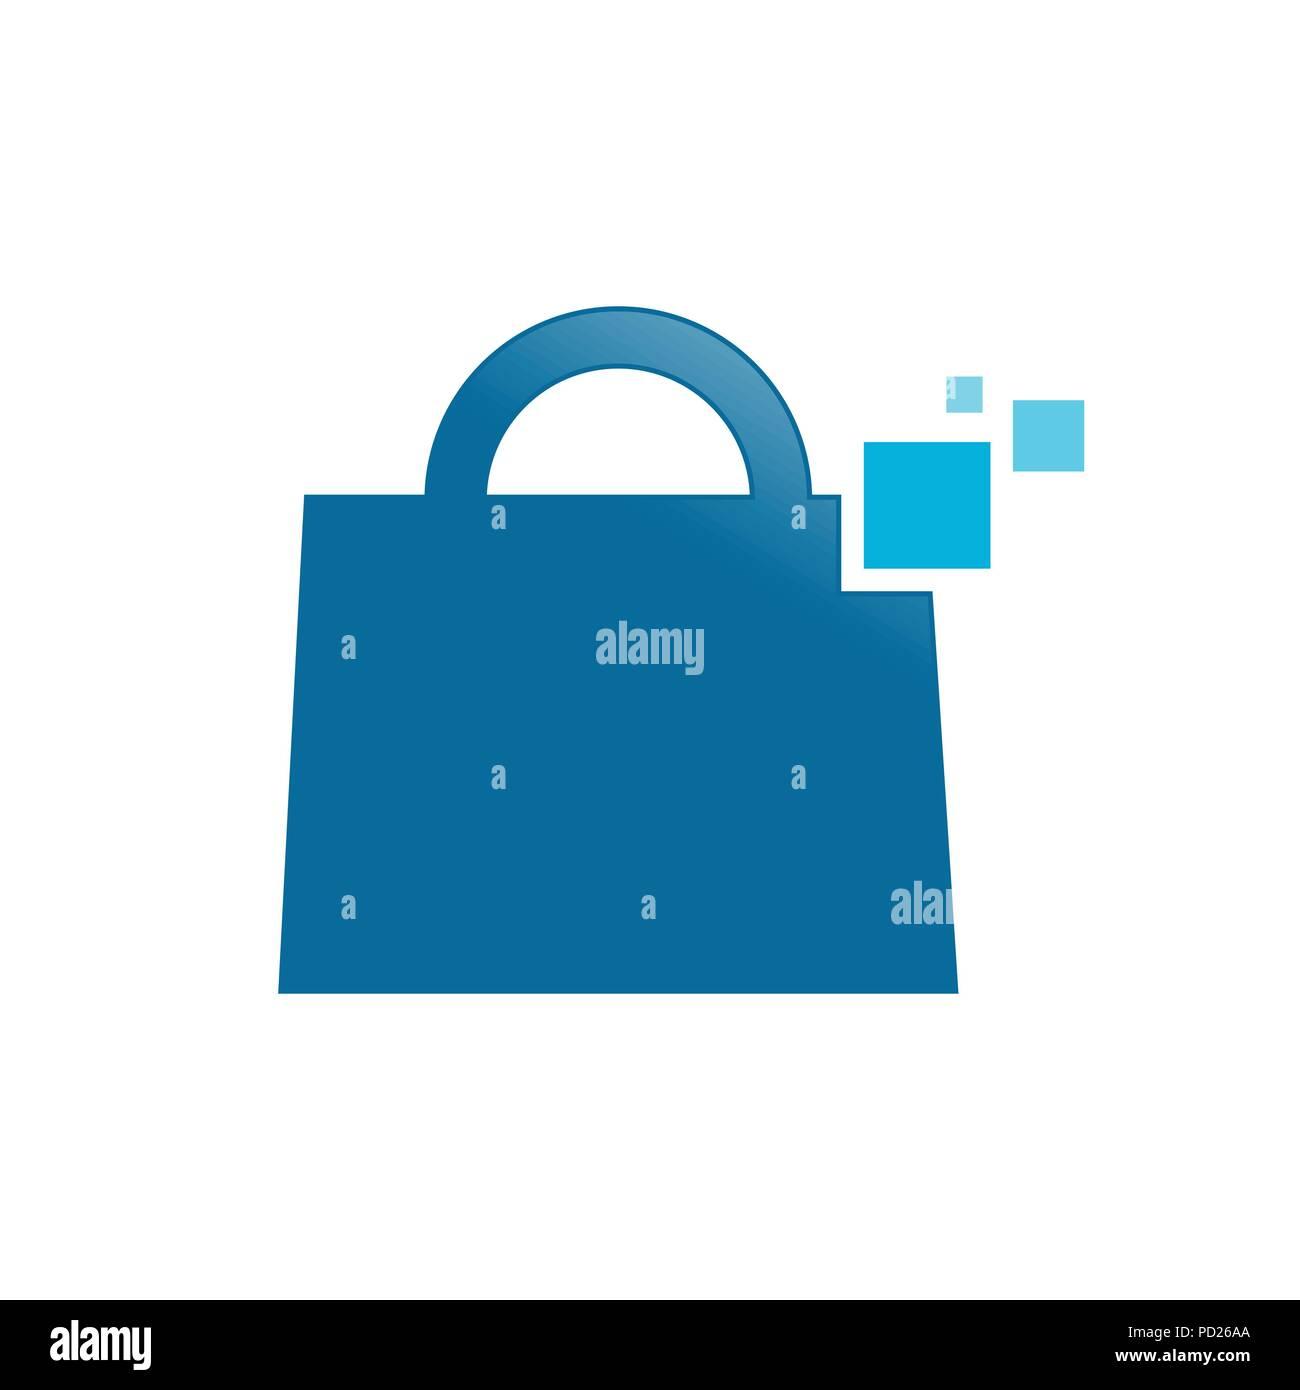 Digital Shopping Bag Vector Symbol Graphic Logo Design Template - Stock Vector